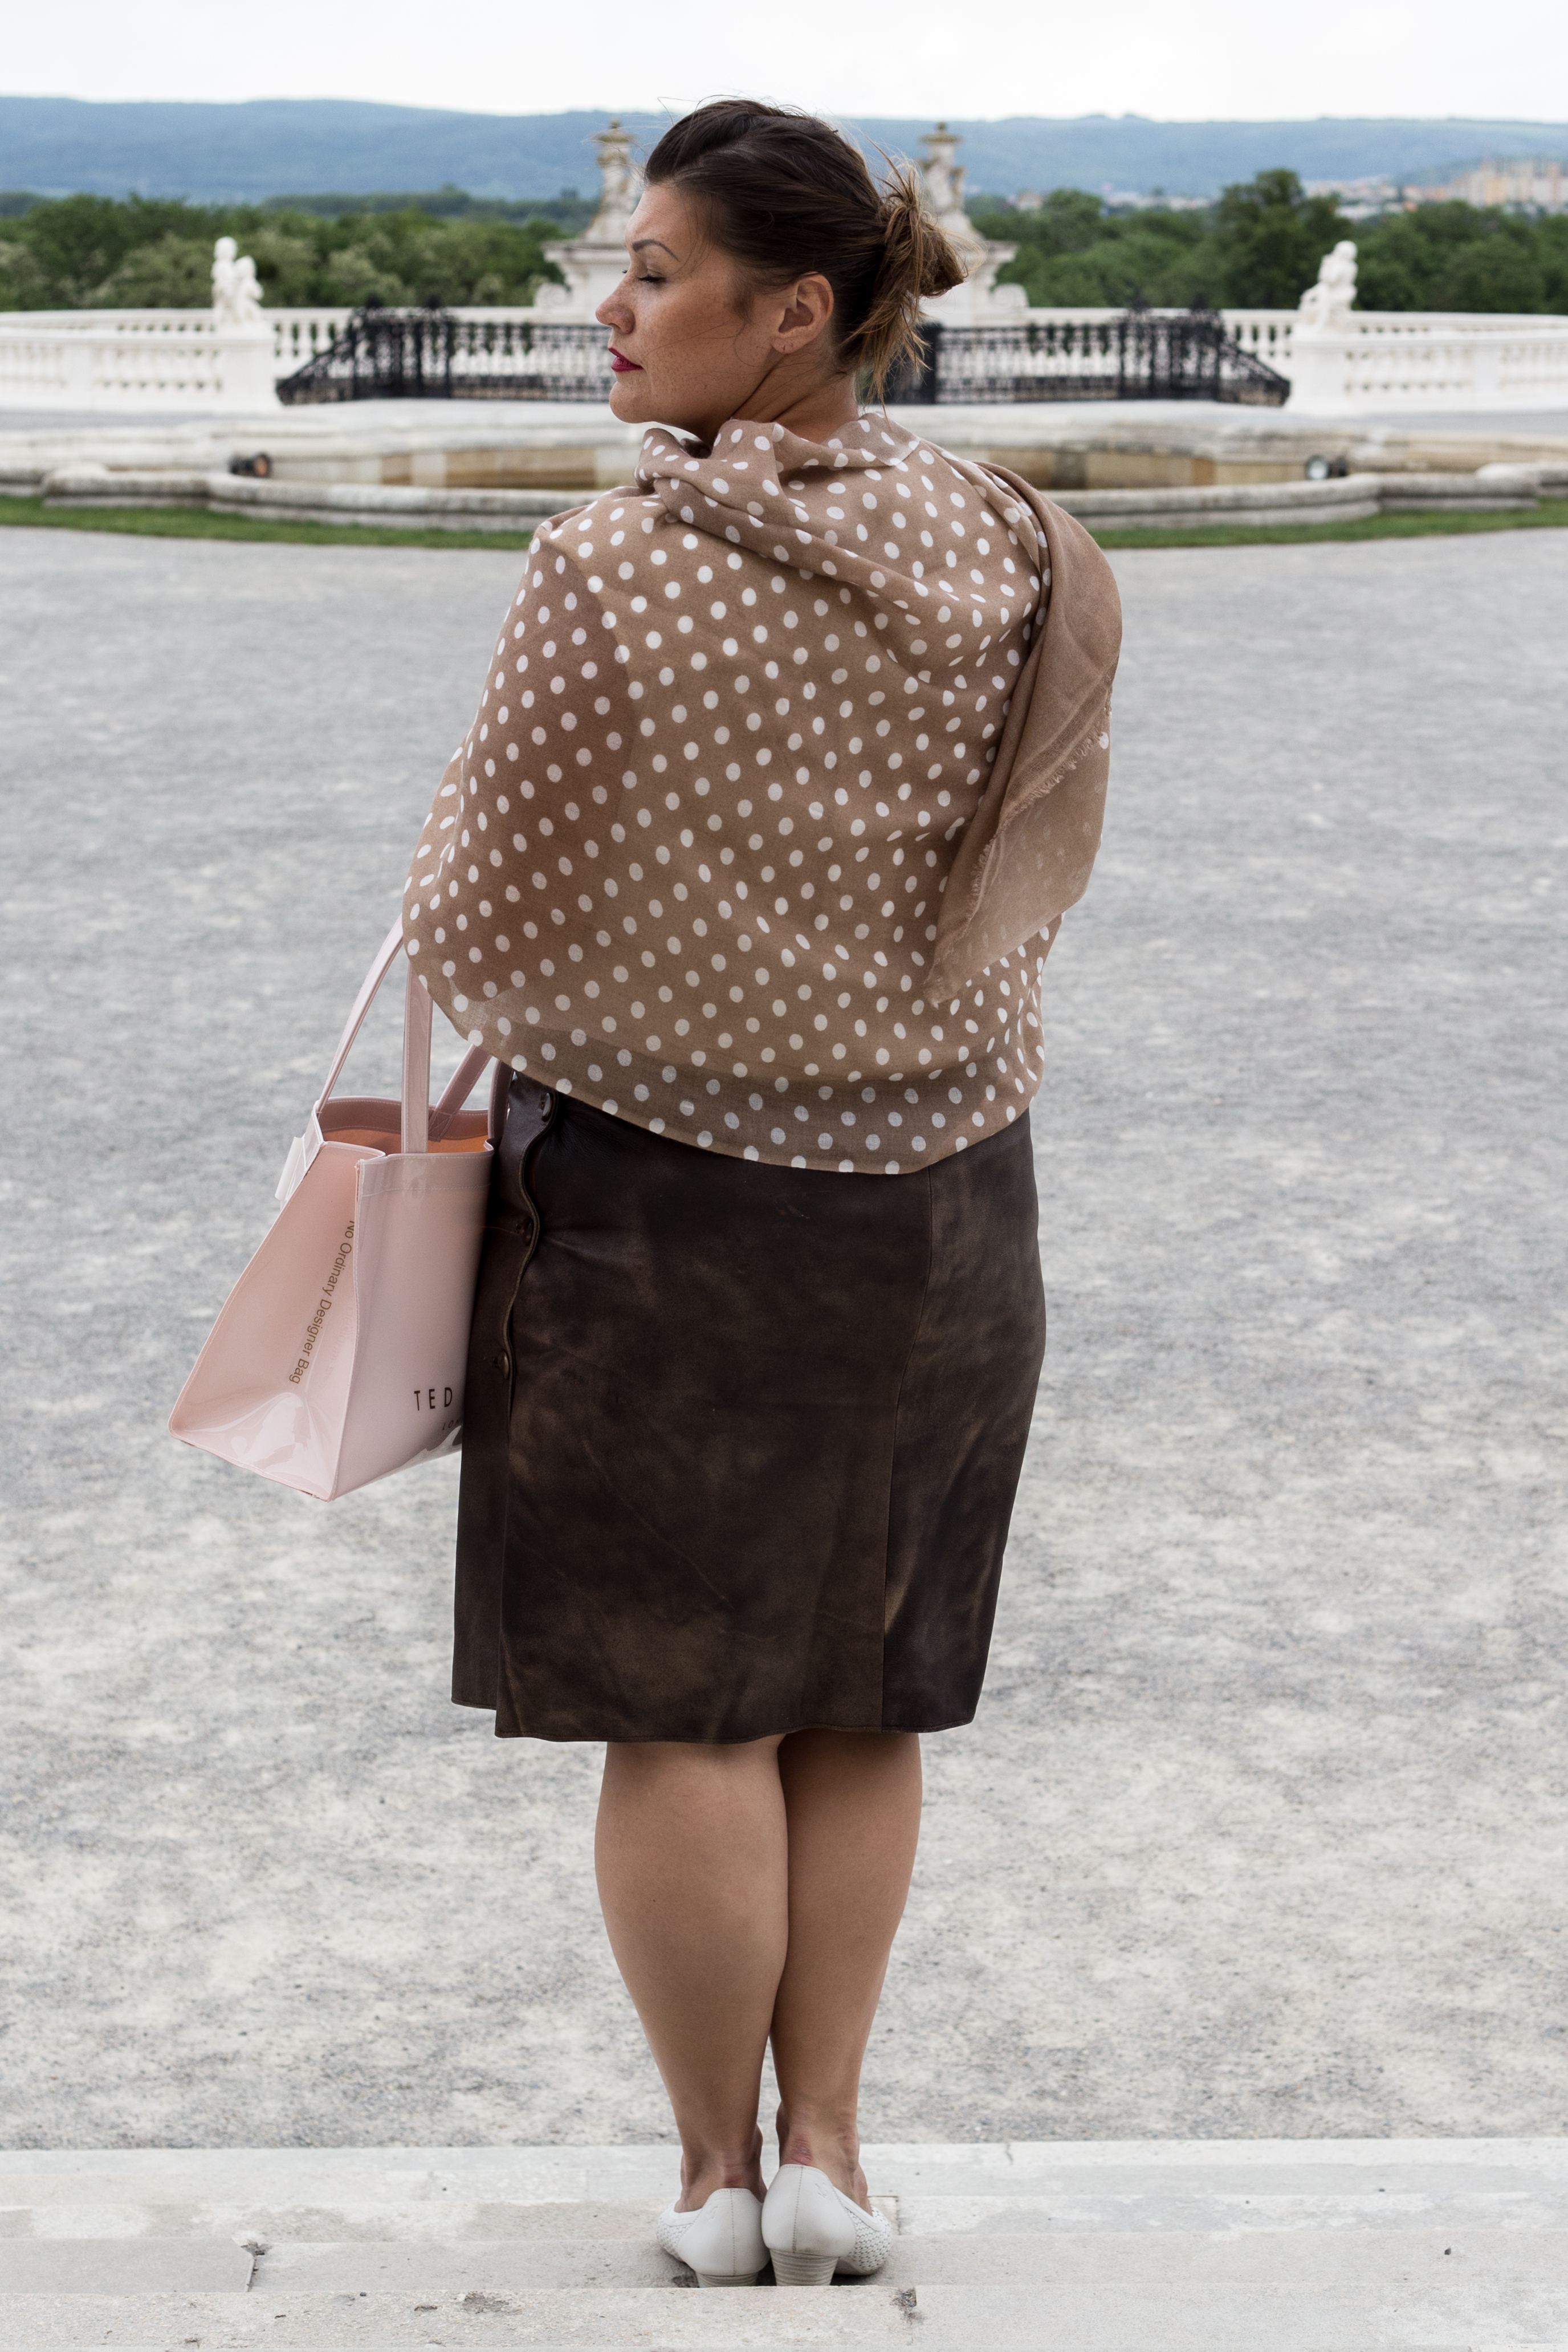 kardiaserena vintage look leder skirt dots scarf maheela ted baker igersaustria peeptoes caprice schloss hof